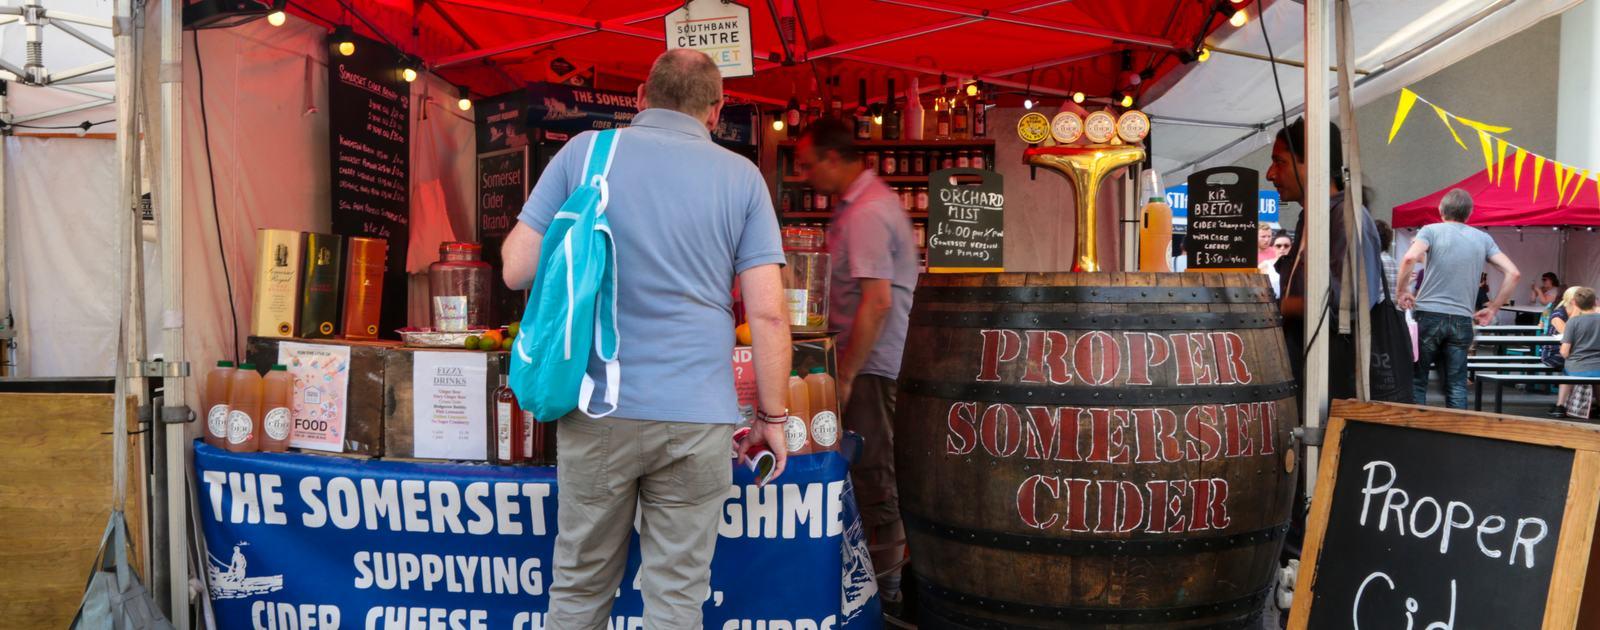 Southbank Centre Food Market.Stall 26 - Somerset Ploughman.August 2016